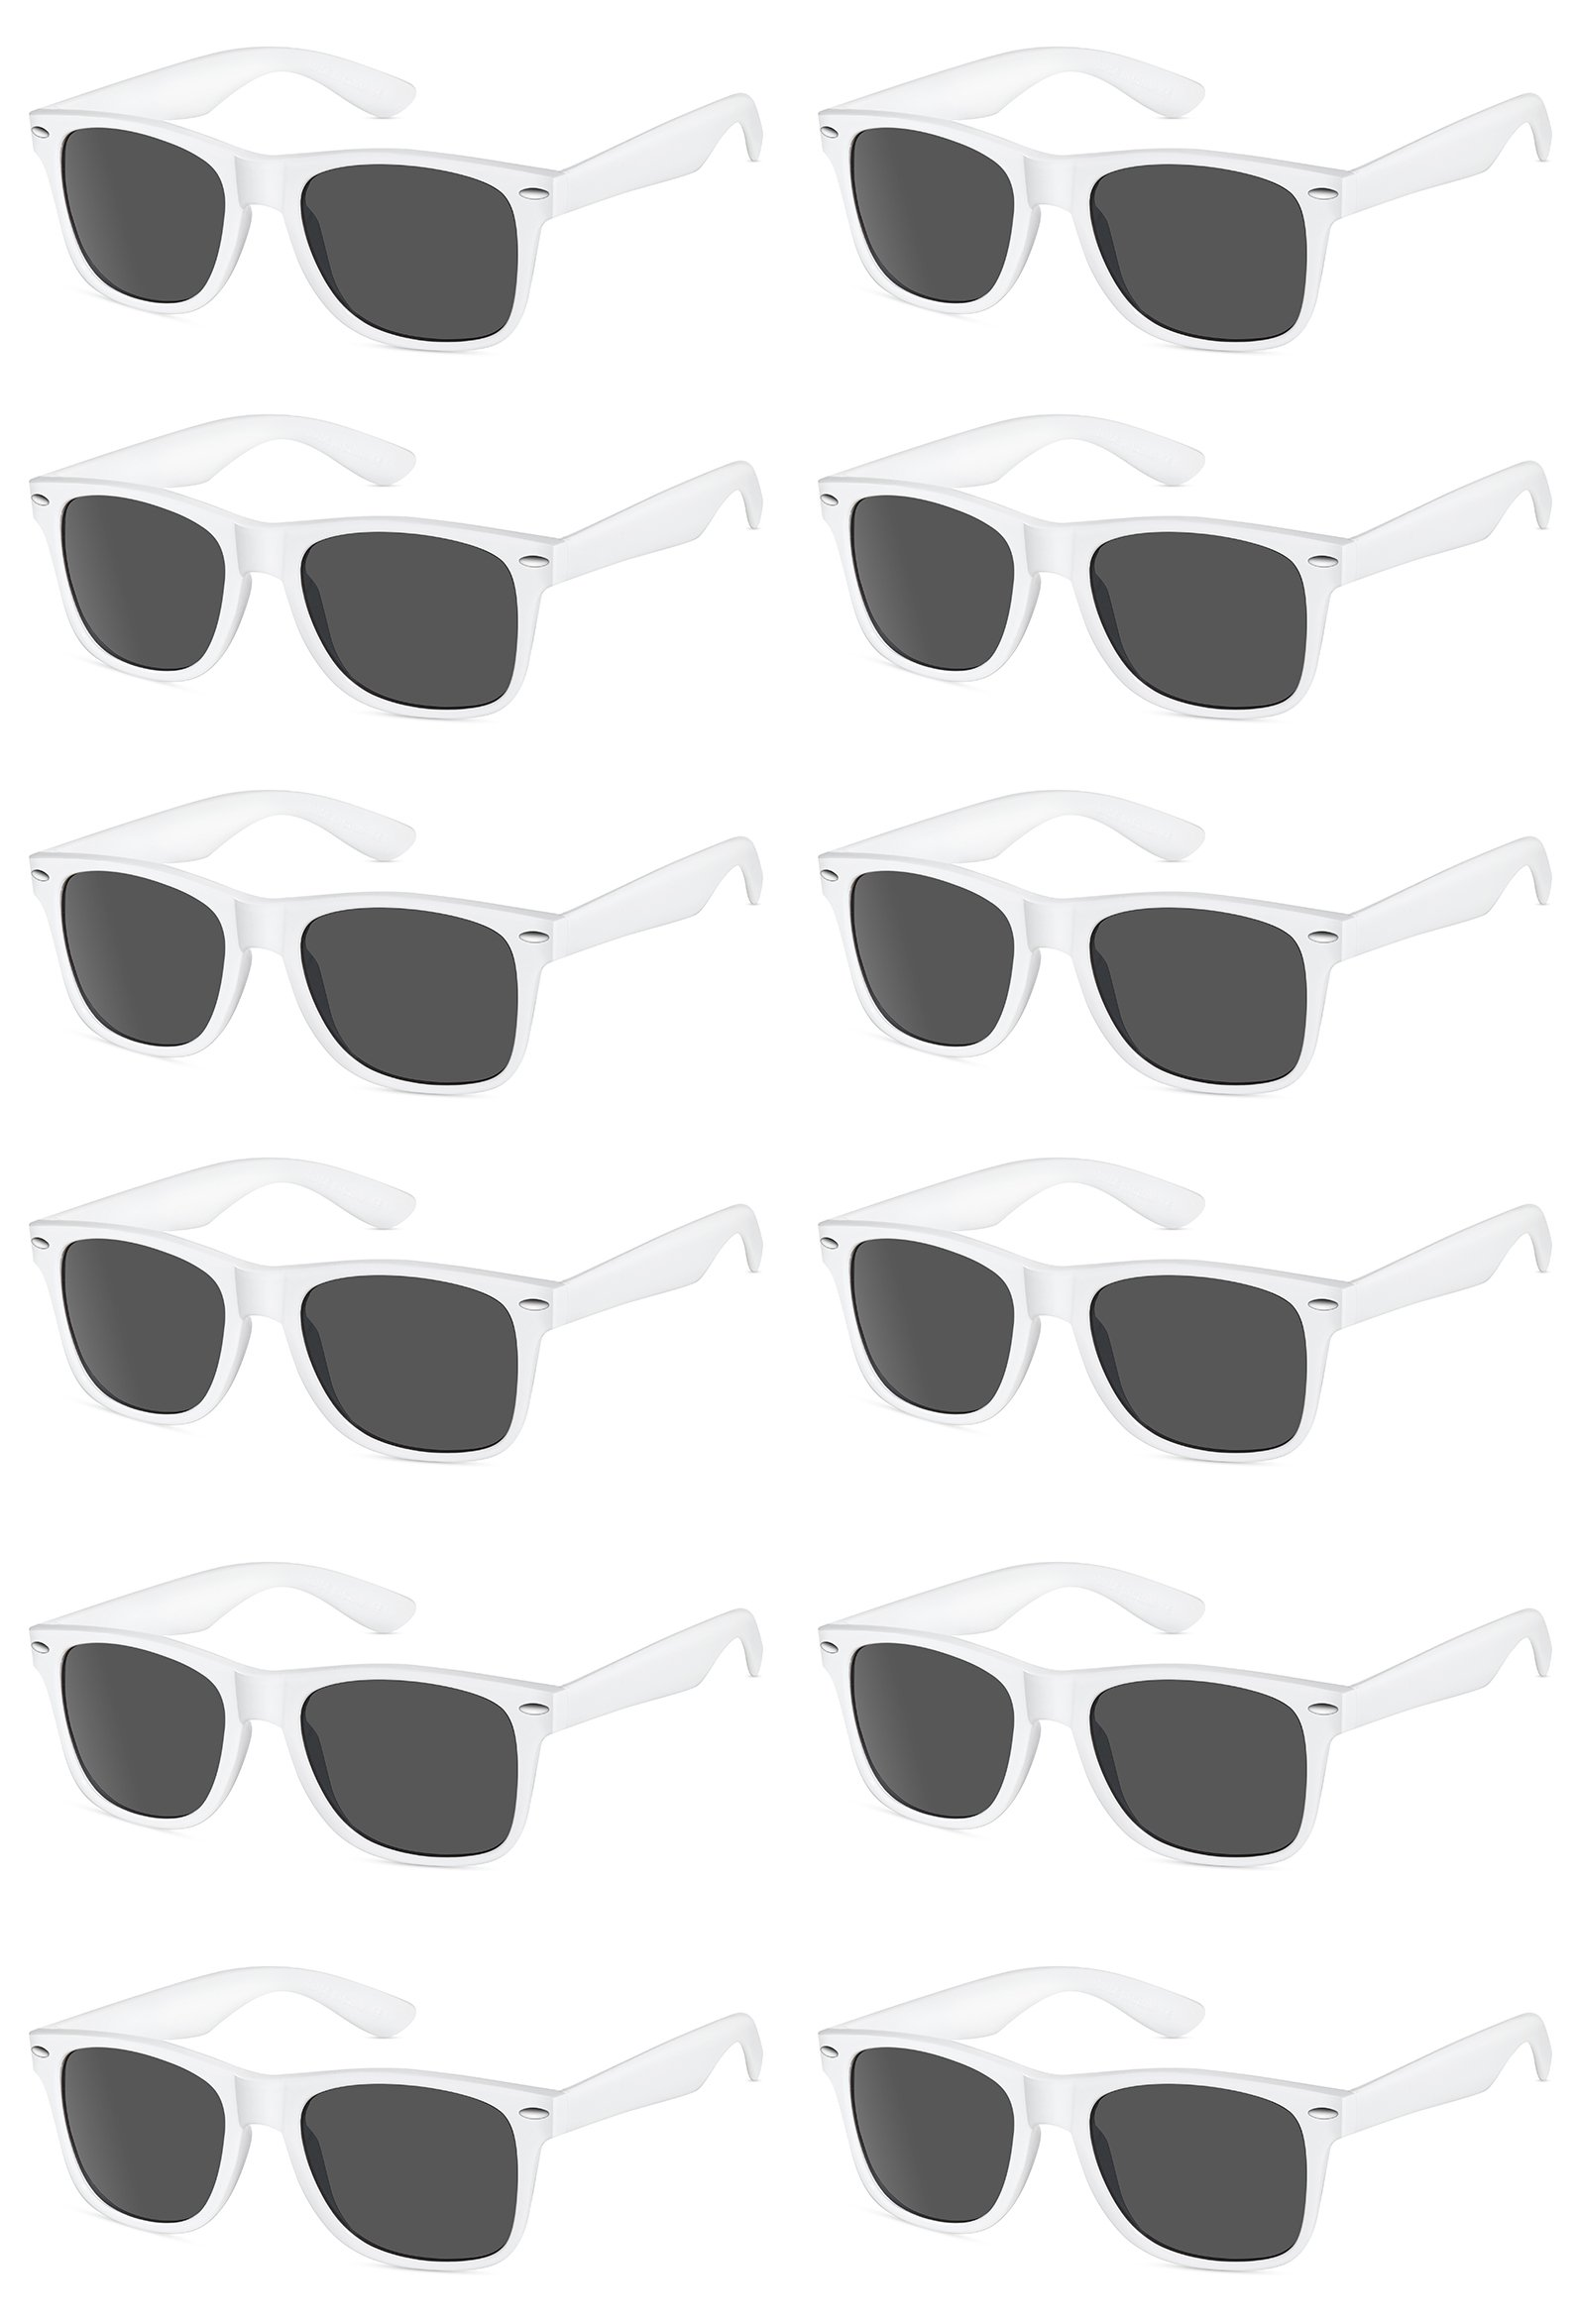 TheGag White Wayfarer Sunglasses Party Pack-12 Pure White Premium Quality Plastic-Wholesale Bulk from